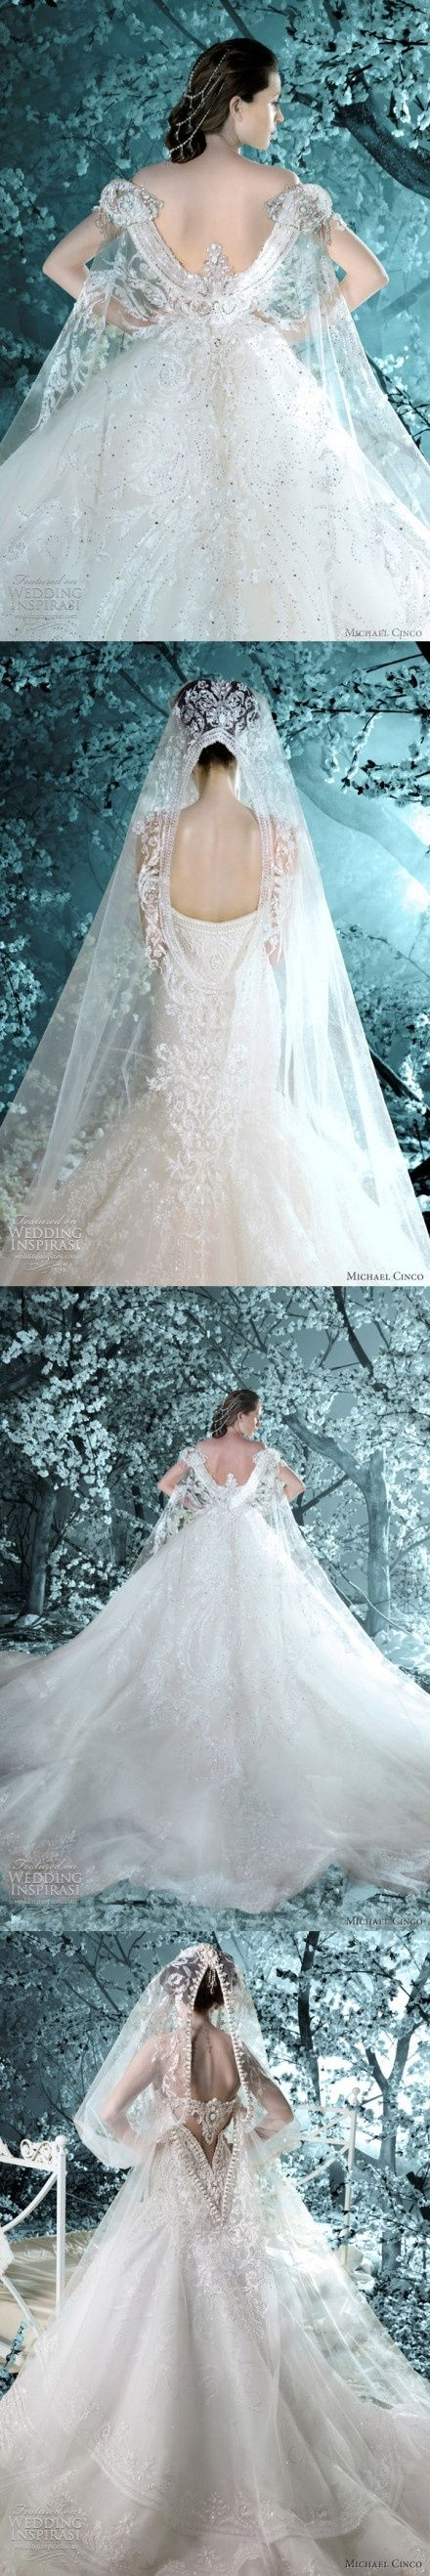 424 best WEDDING DRESSES and IDEAS images on Pinterest | Short ...